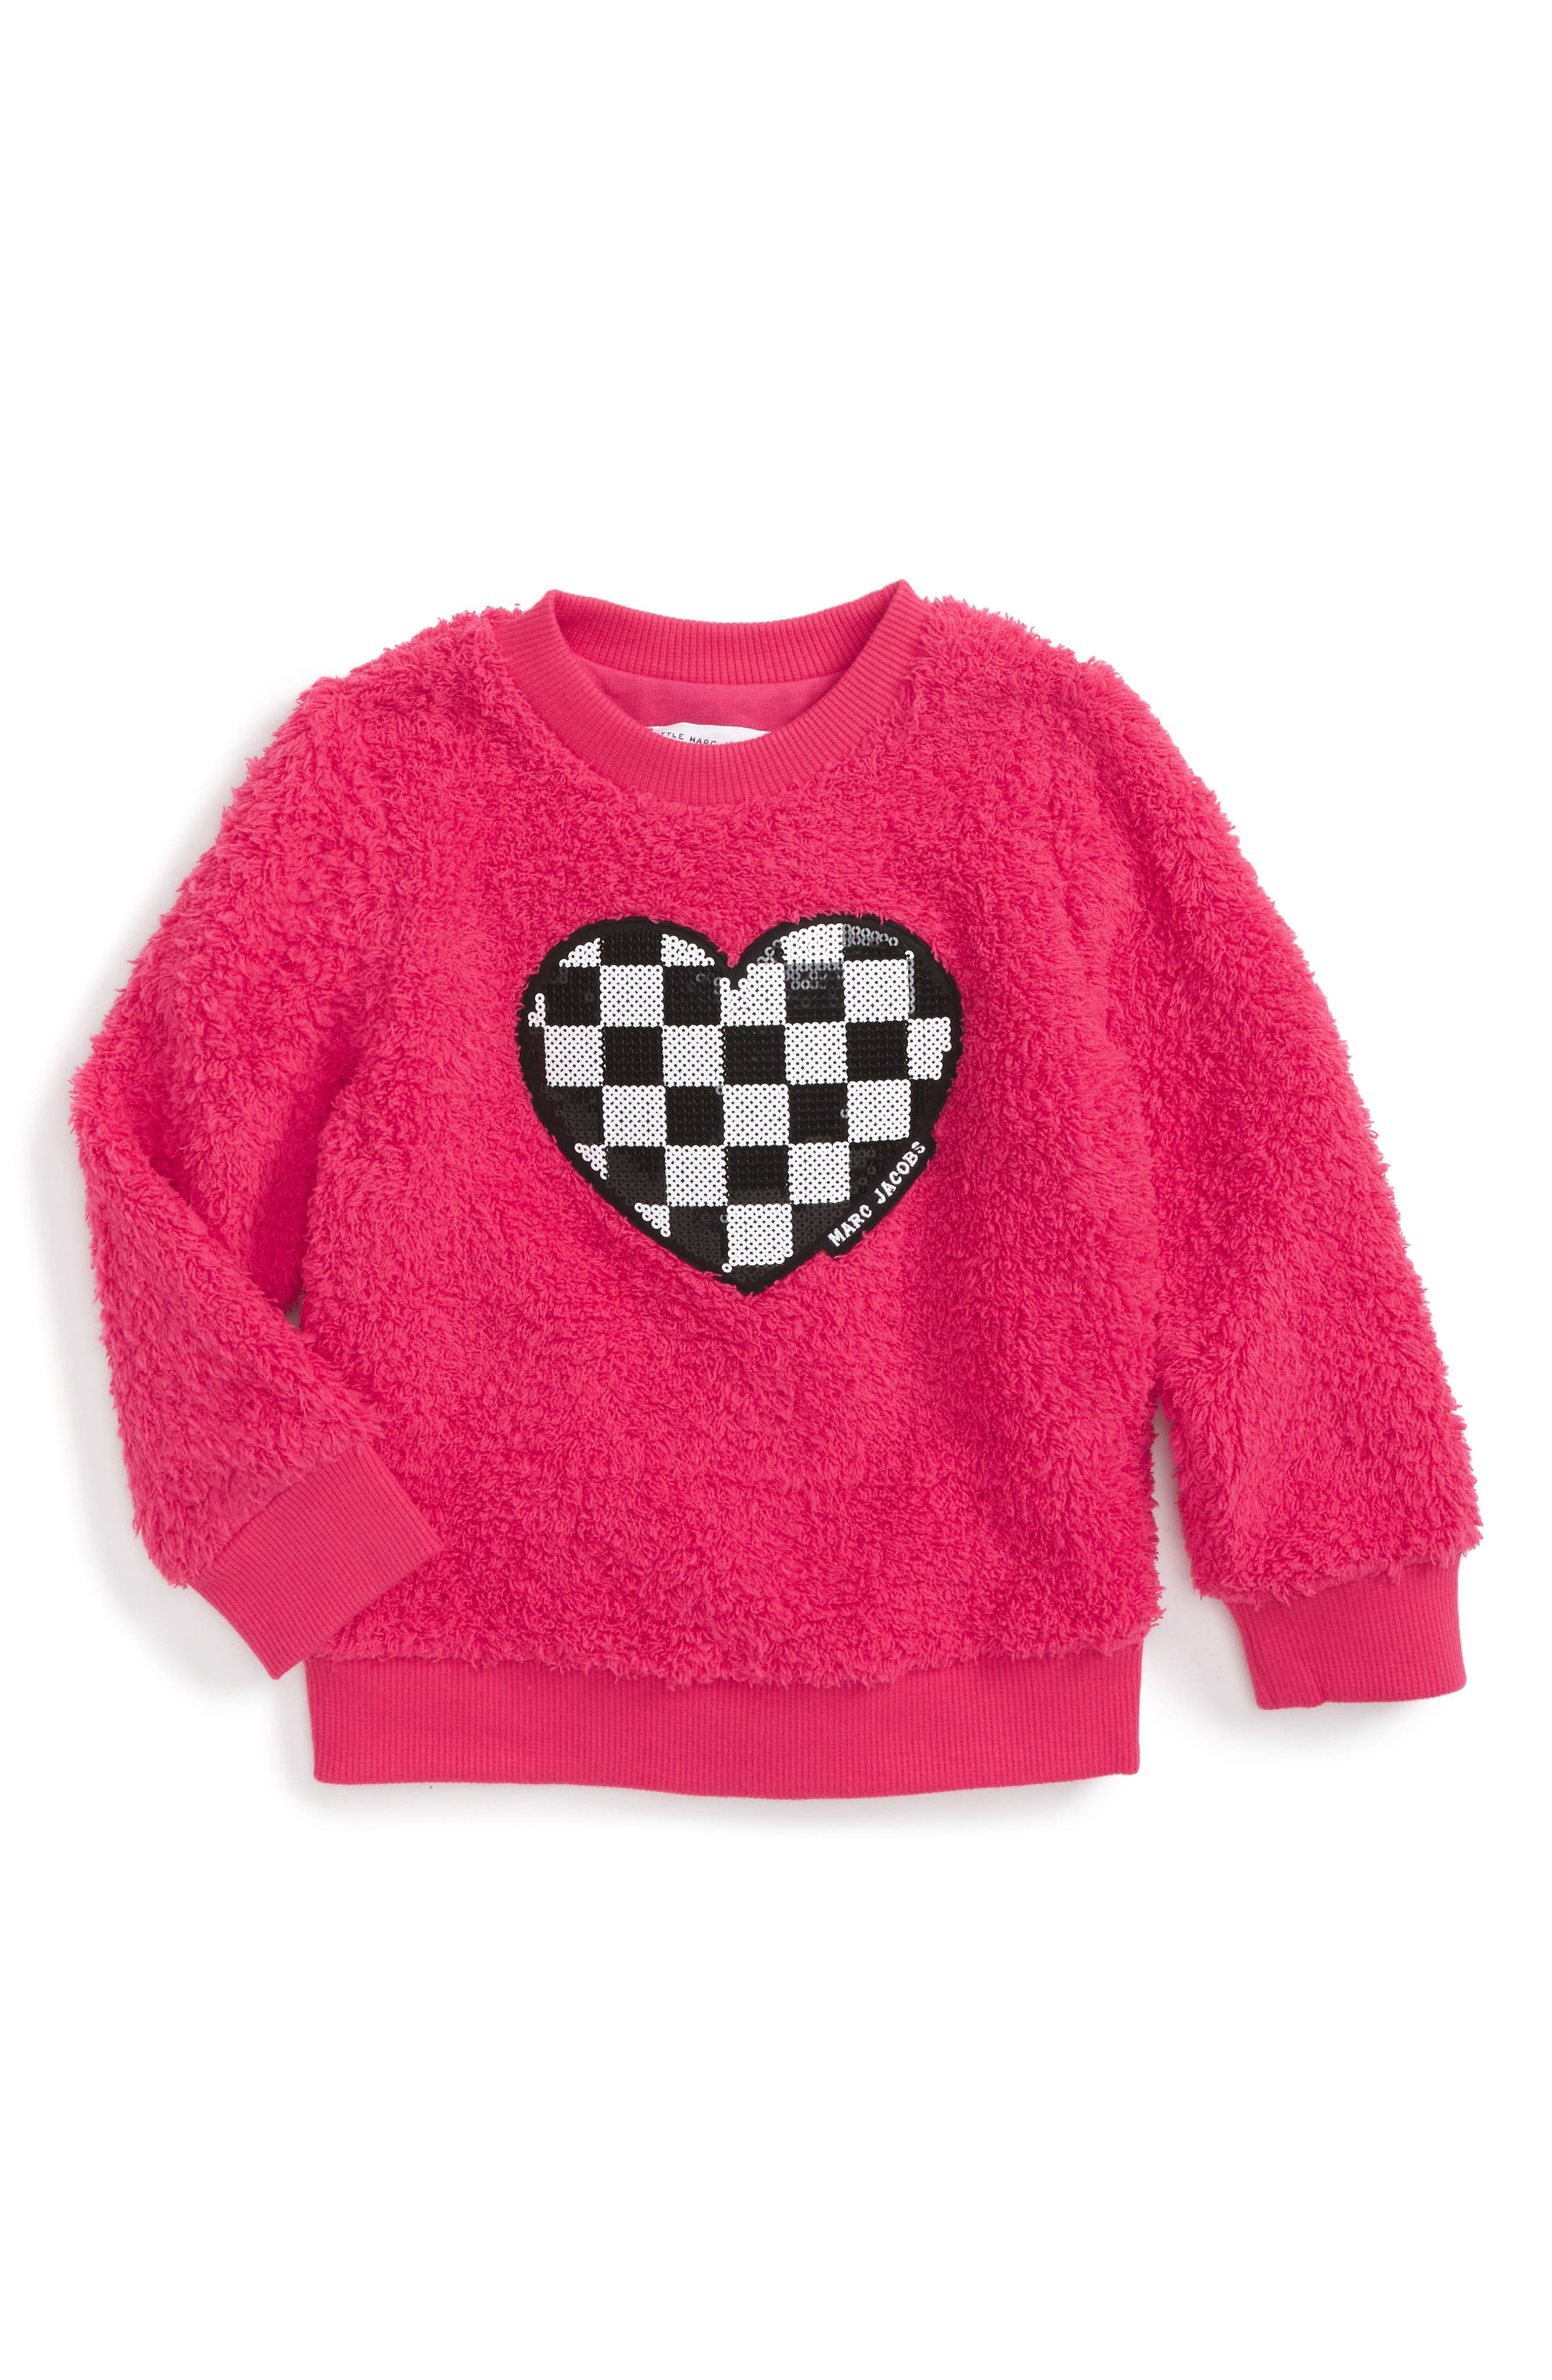 Alternate Image 1 Selected - LITTLE MARC JACOBS Sequin Heart Fuzzy Sweatshirt (Toddler Girls, Little Girls & Big Girls)